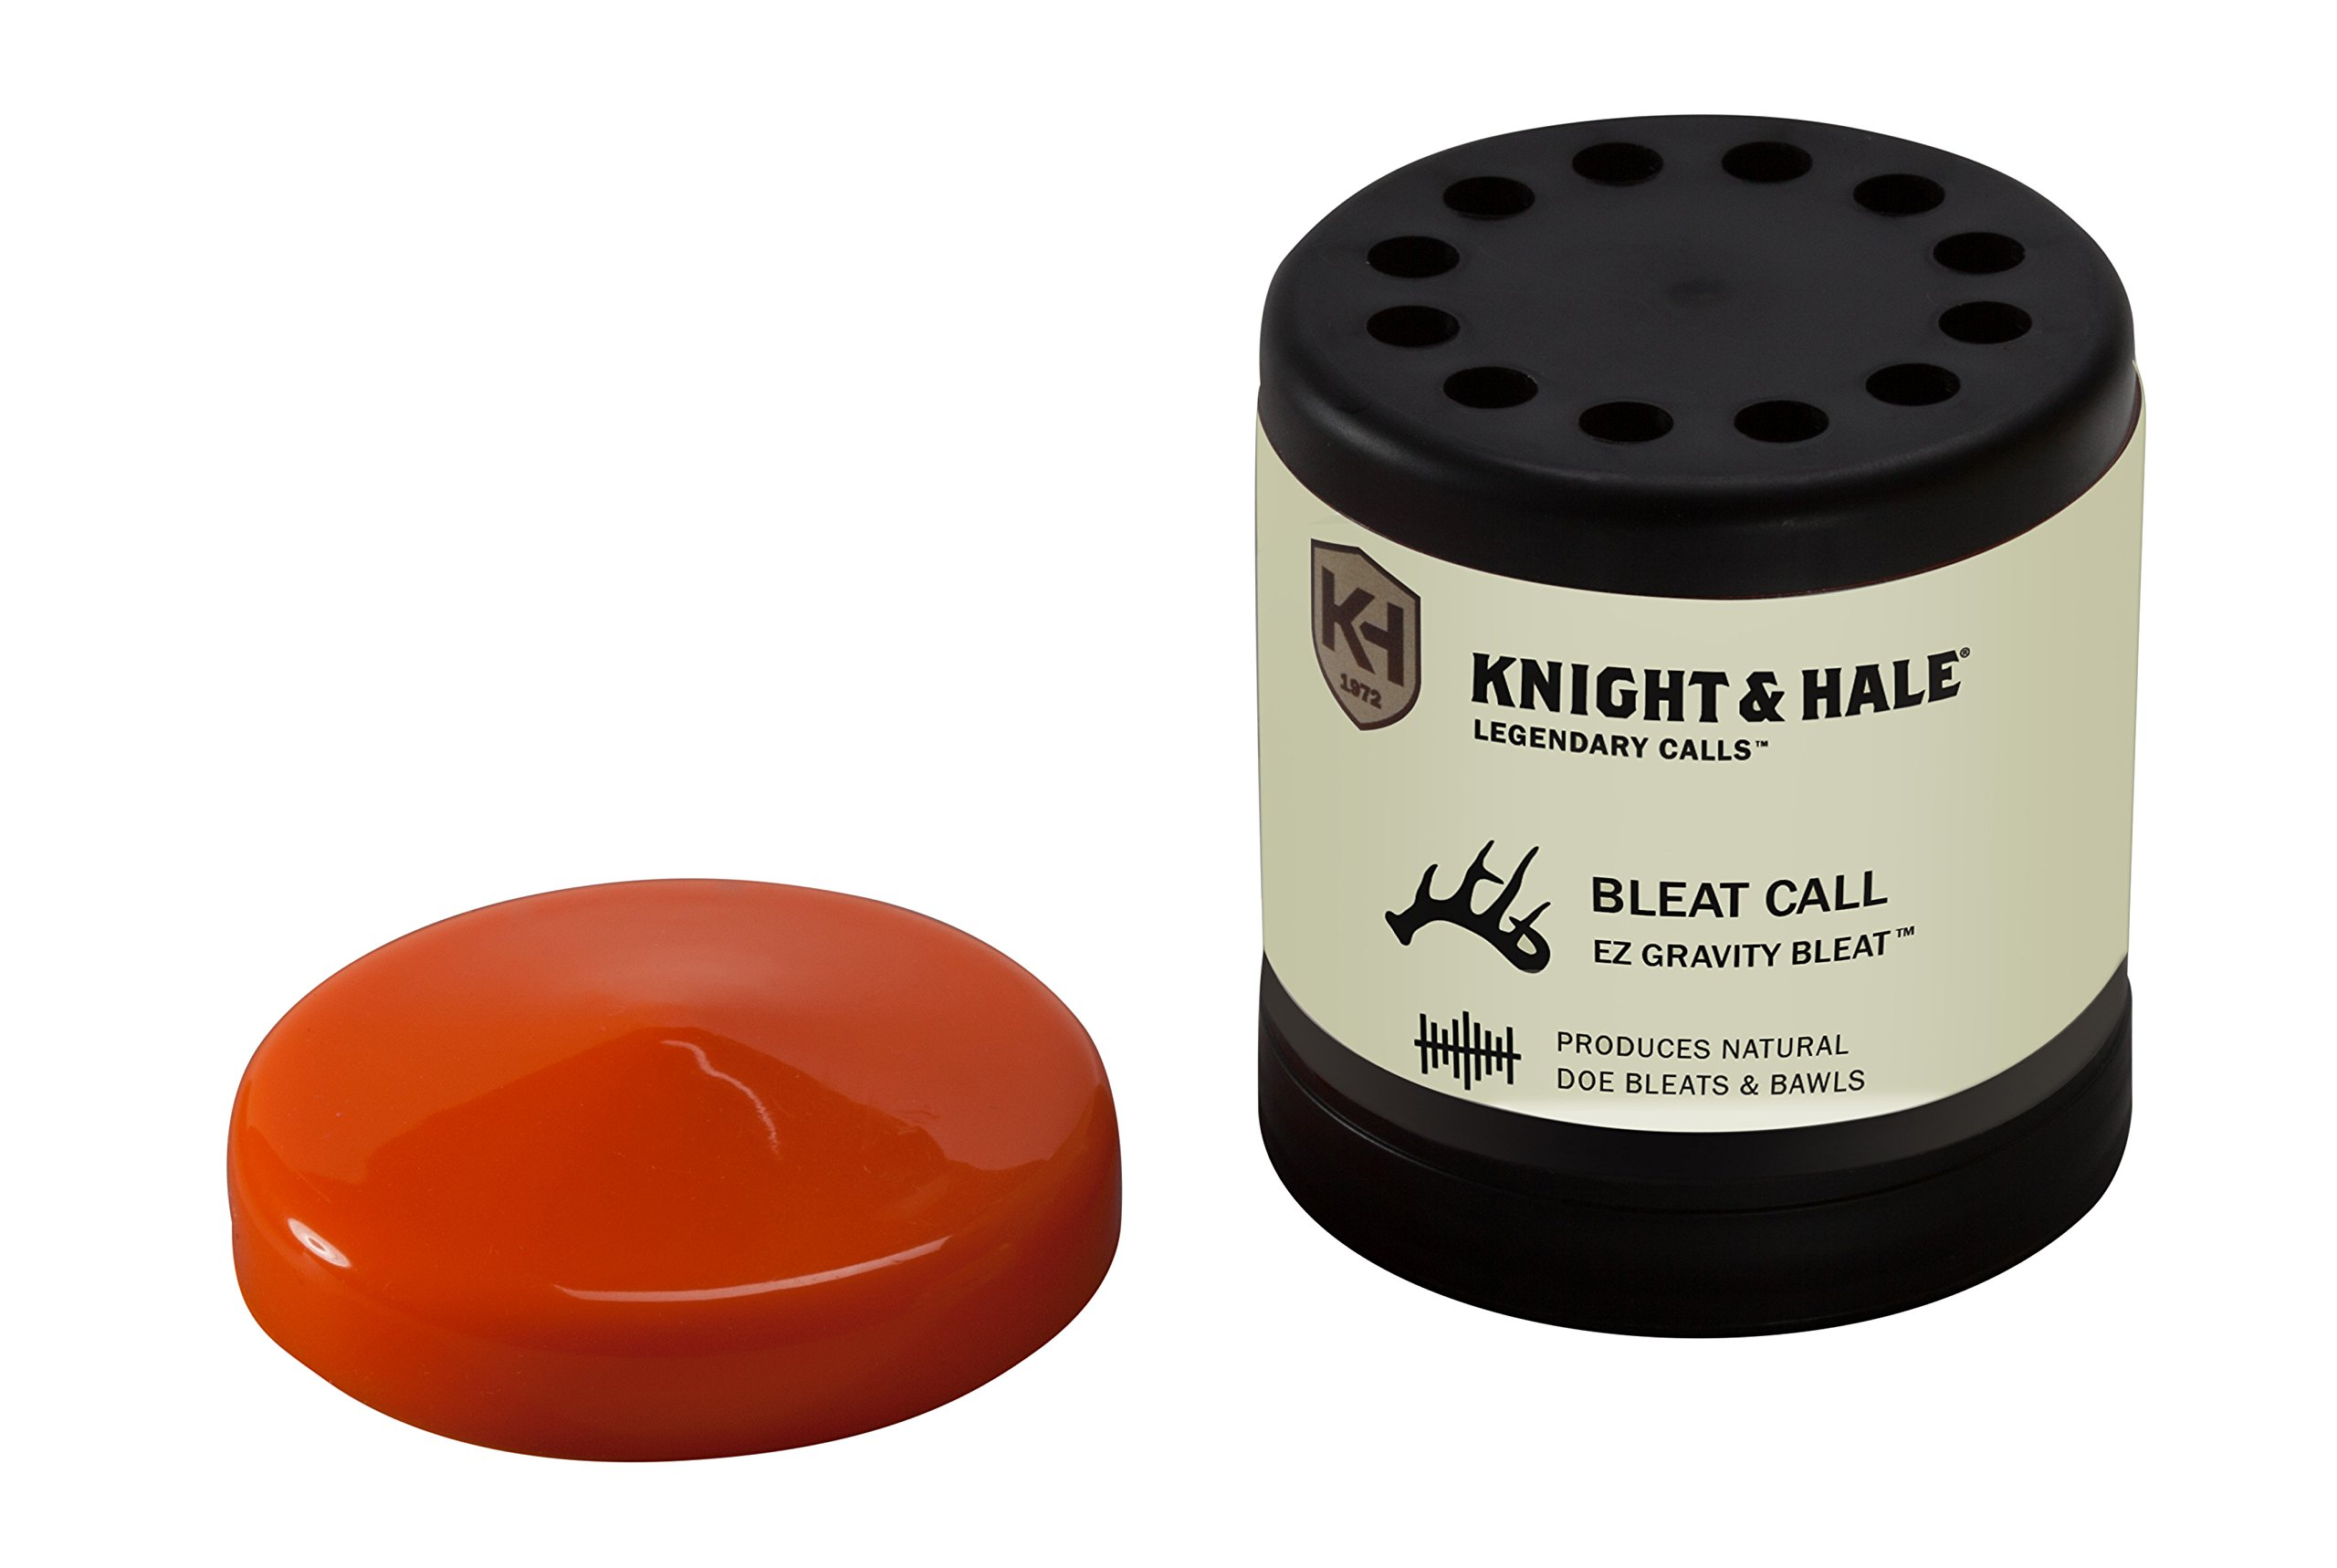 Knight & Hale EZ Gravity Bleat Deer Call